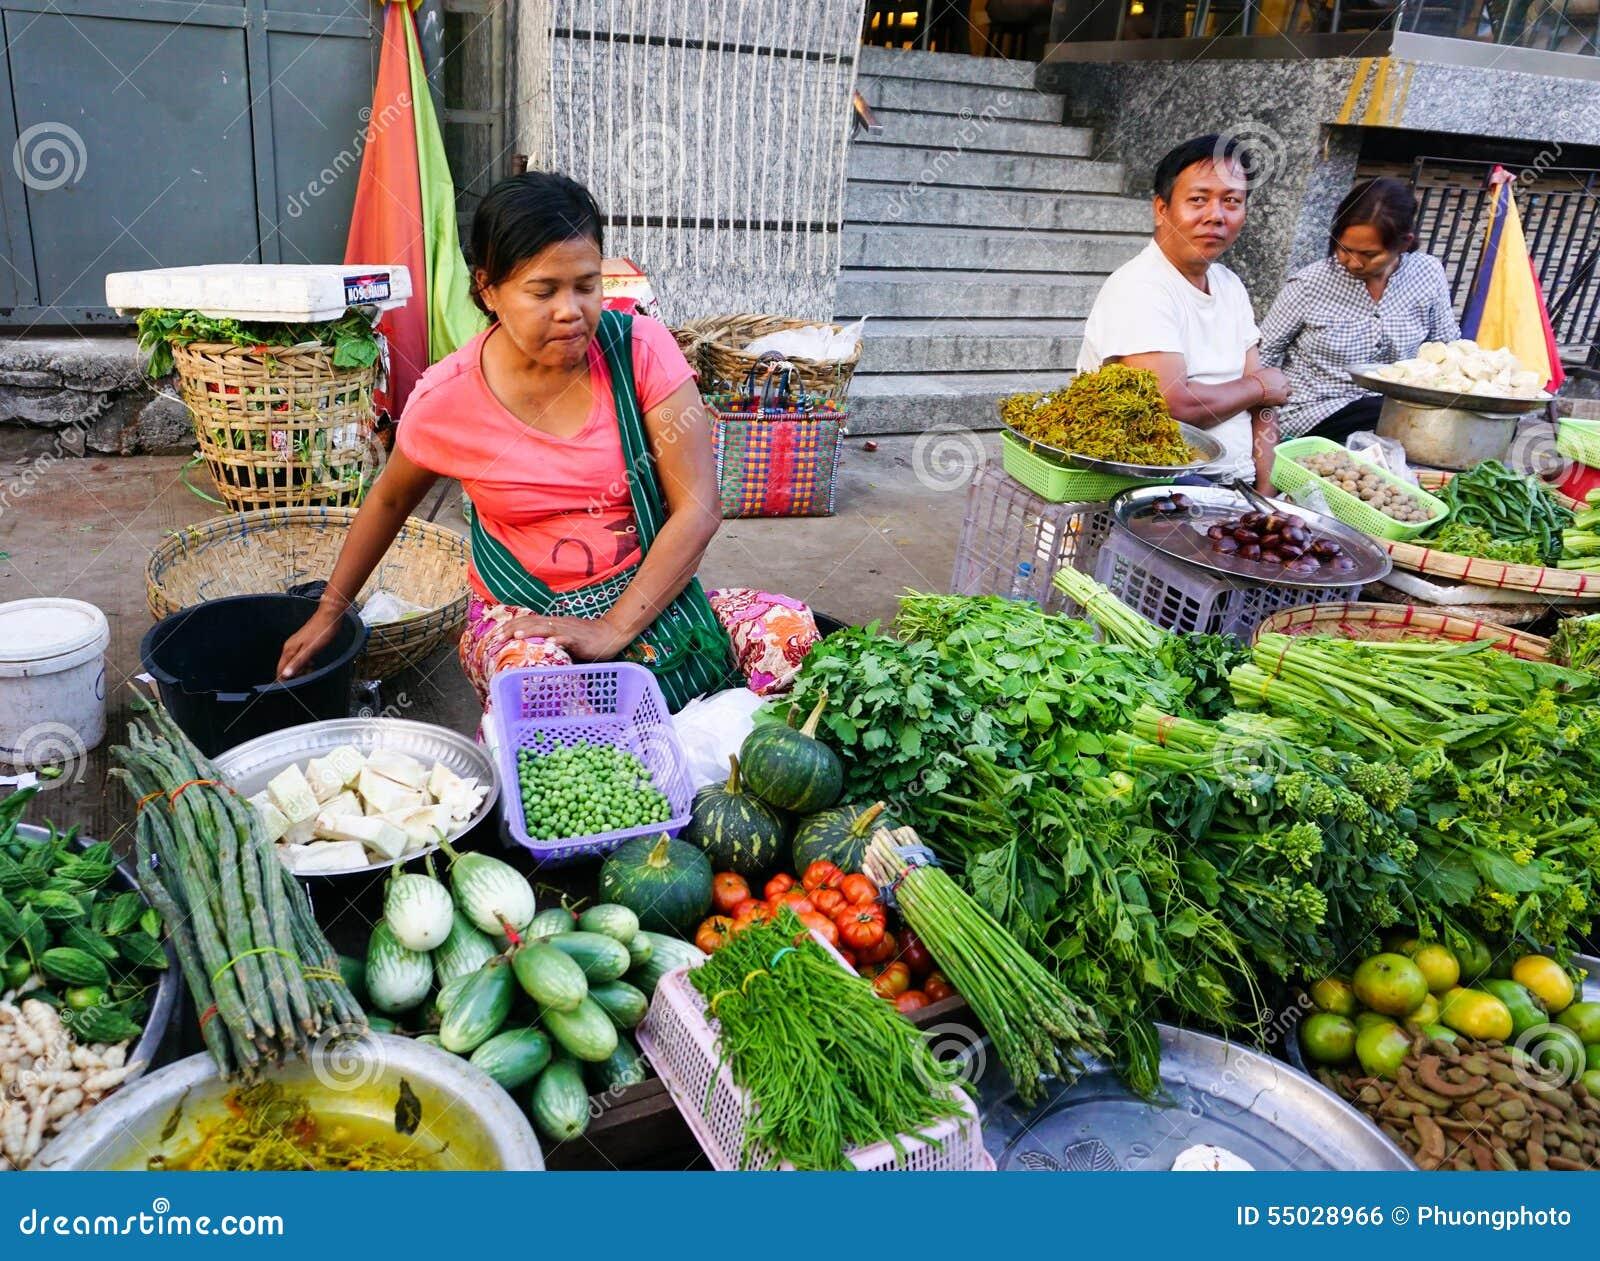 Burmese women selling fresh fruits at Bogyoke market